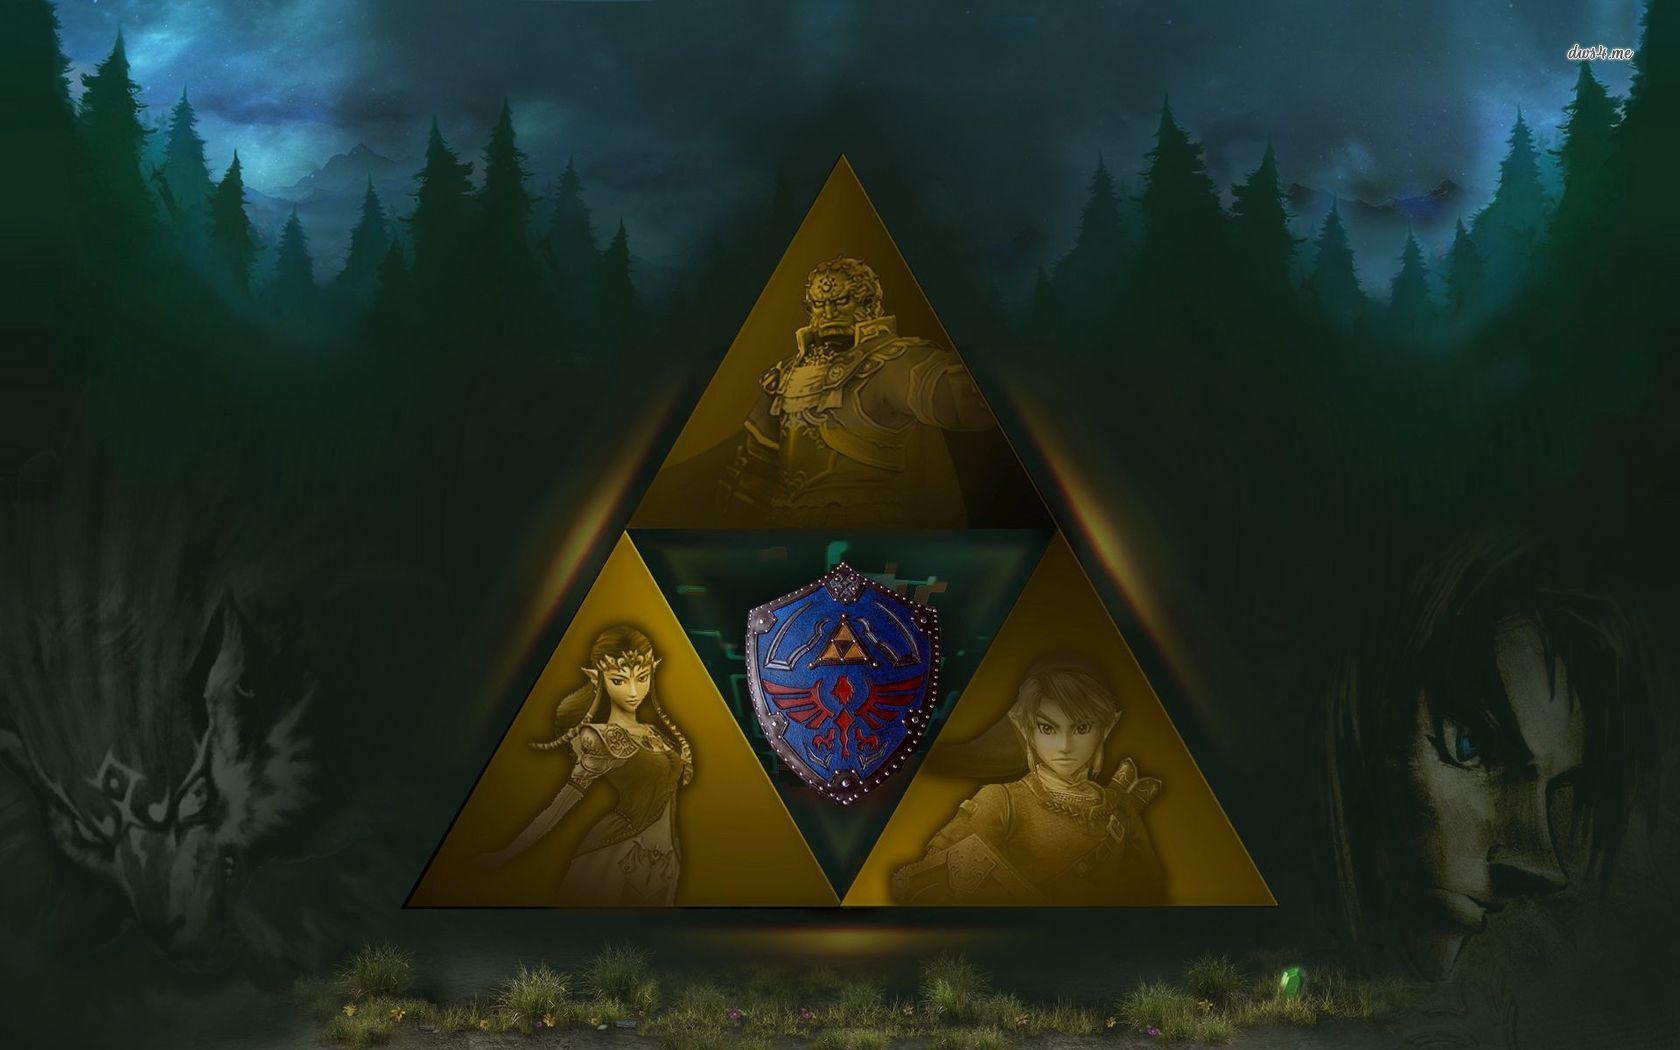 [49+] Zelda 4K Wallpaper on WallpaperSafari